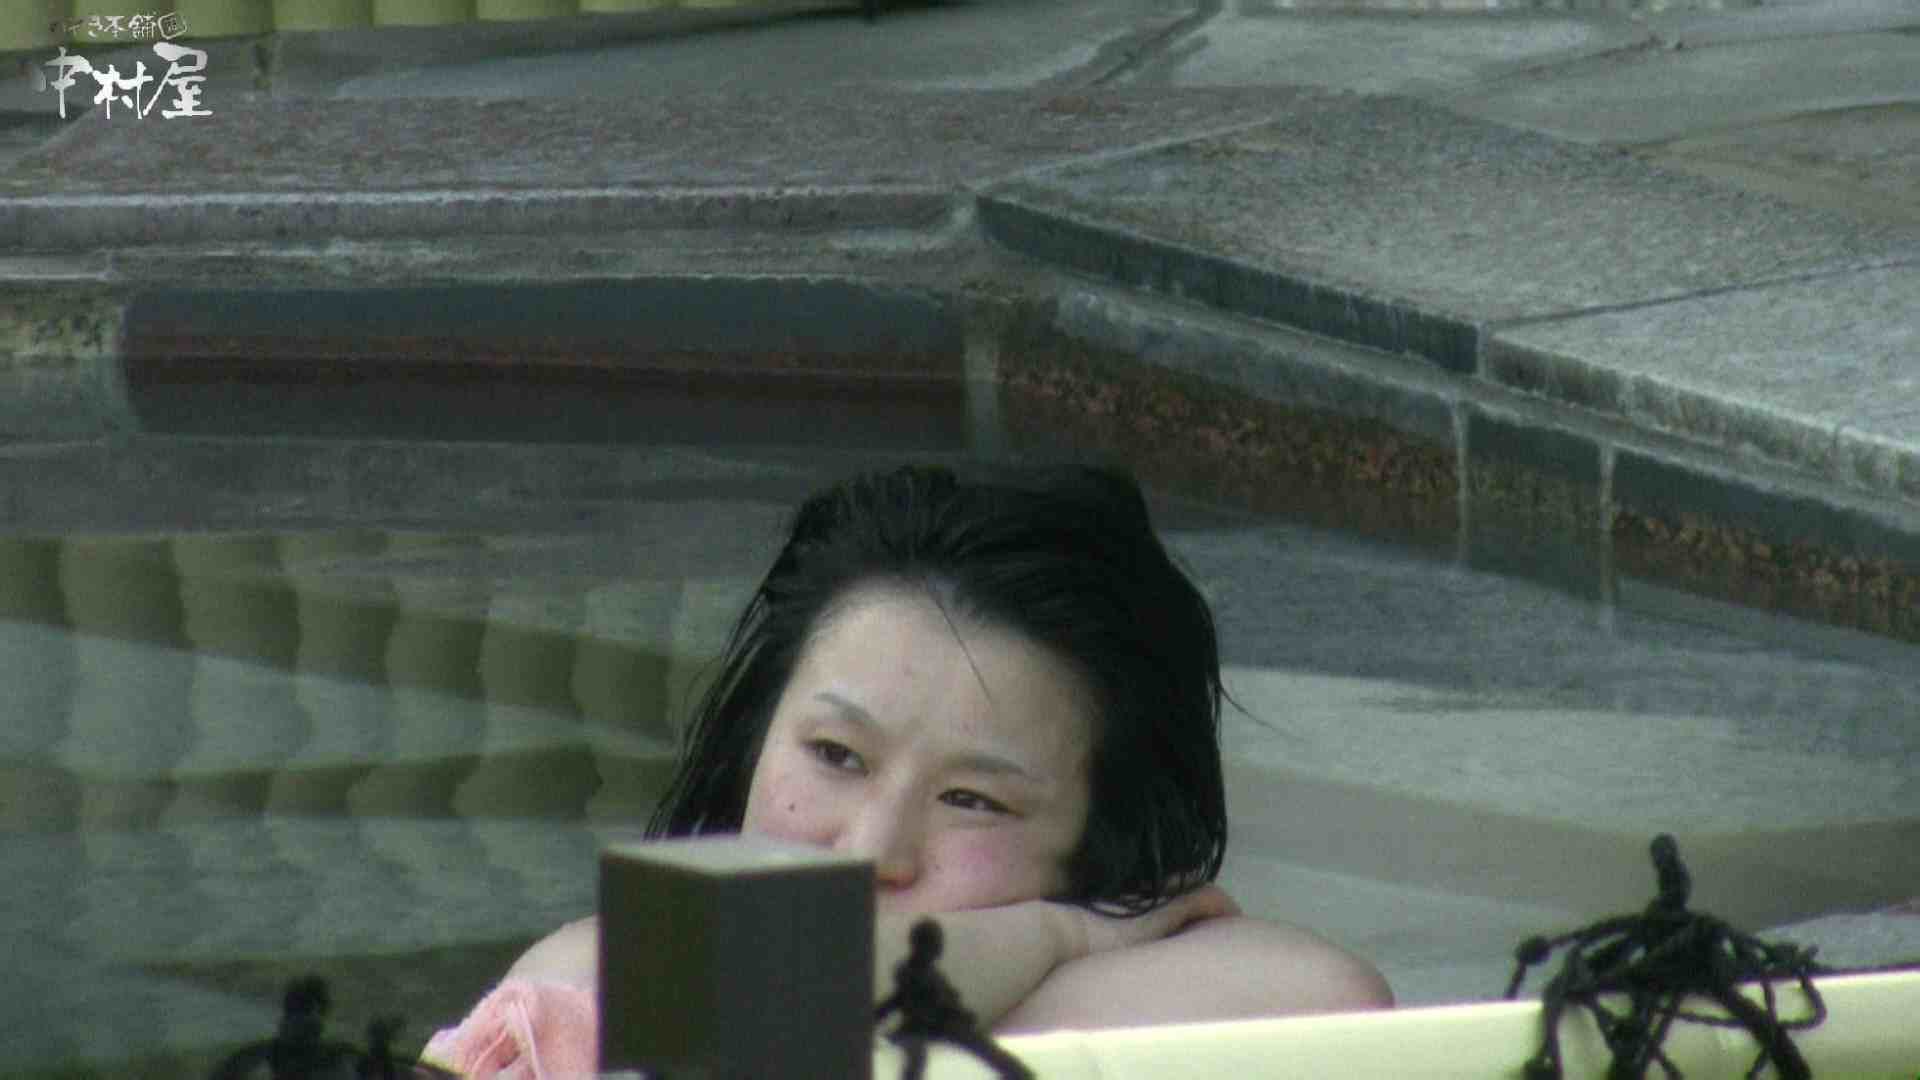 Aquaな露天風呂Vol.982 露天風呂編   盗撮シリーズ  78PIX 77